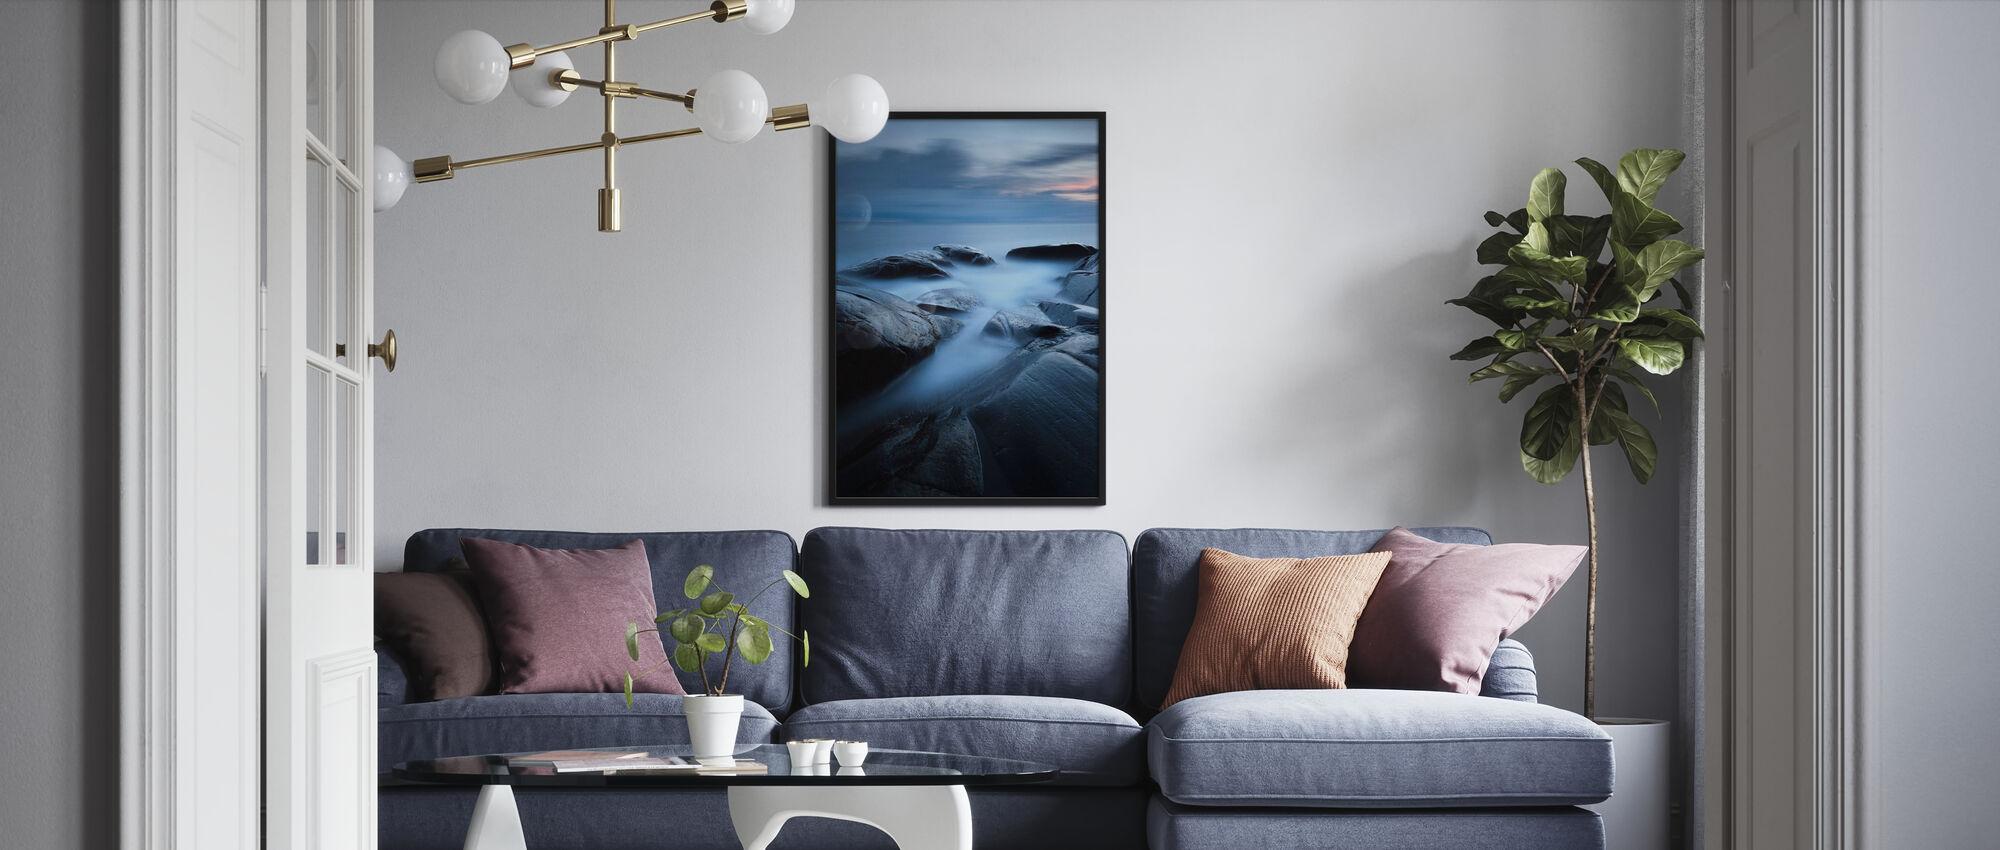 Grainy 352 Seconds - Framed print - Living Room